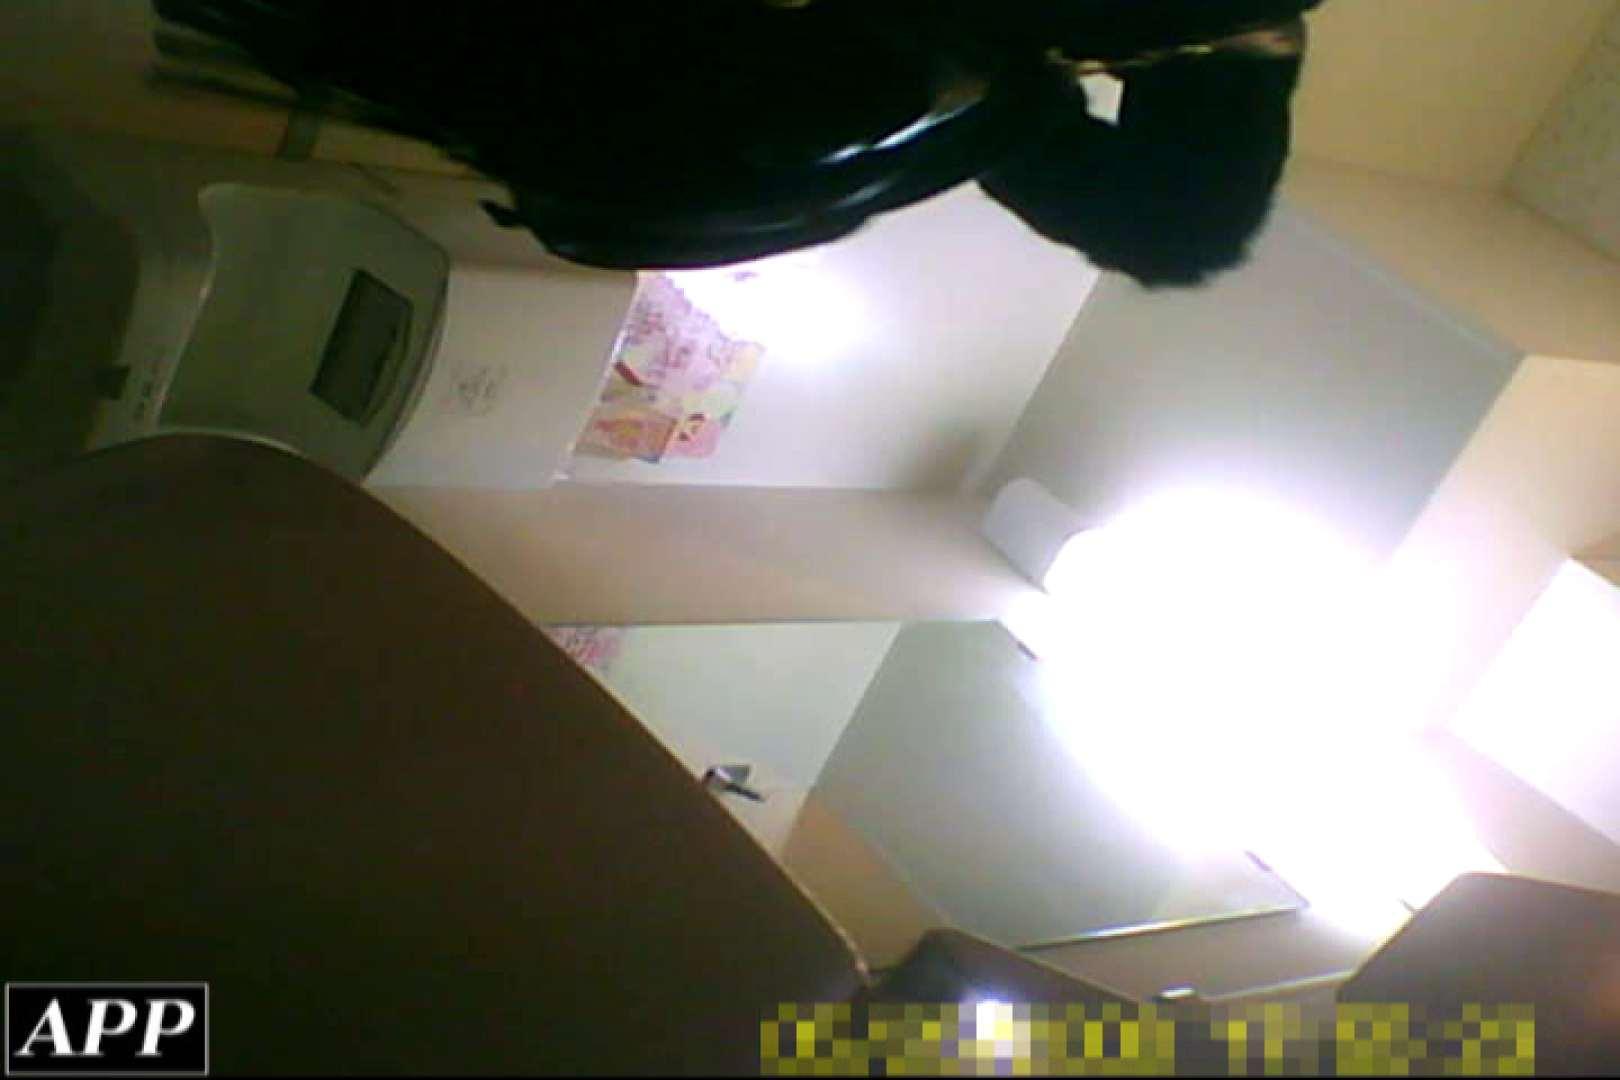 3視点洗面所 vol.63 OLハメ撮り  97Pix 93